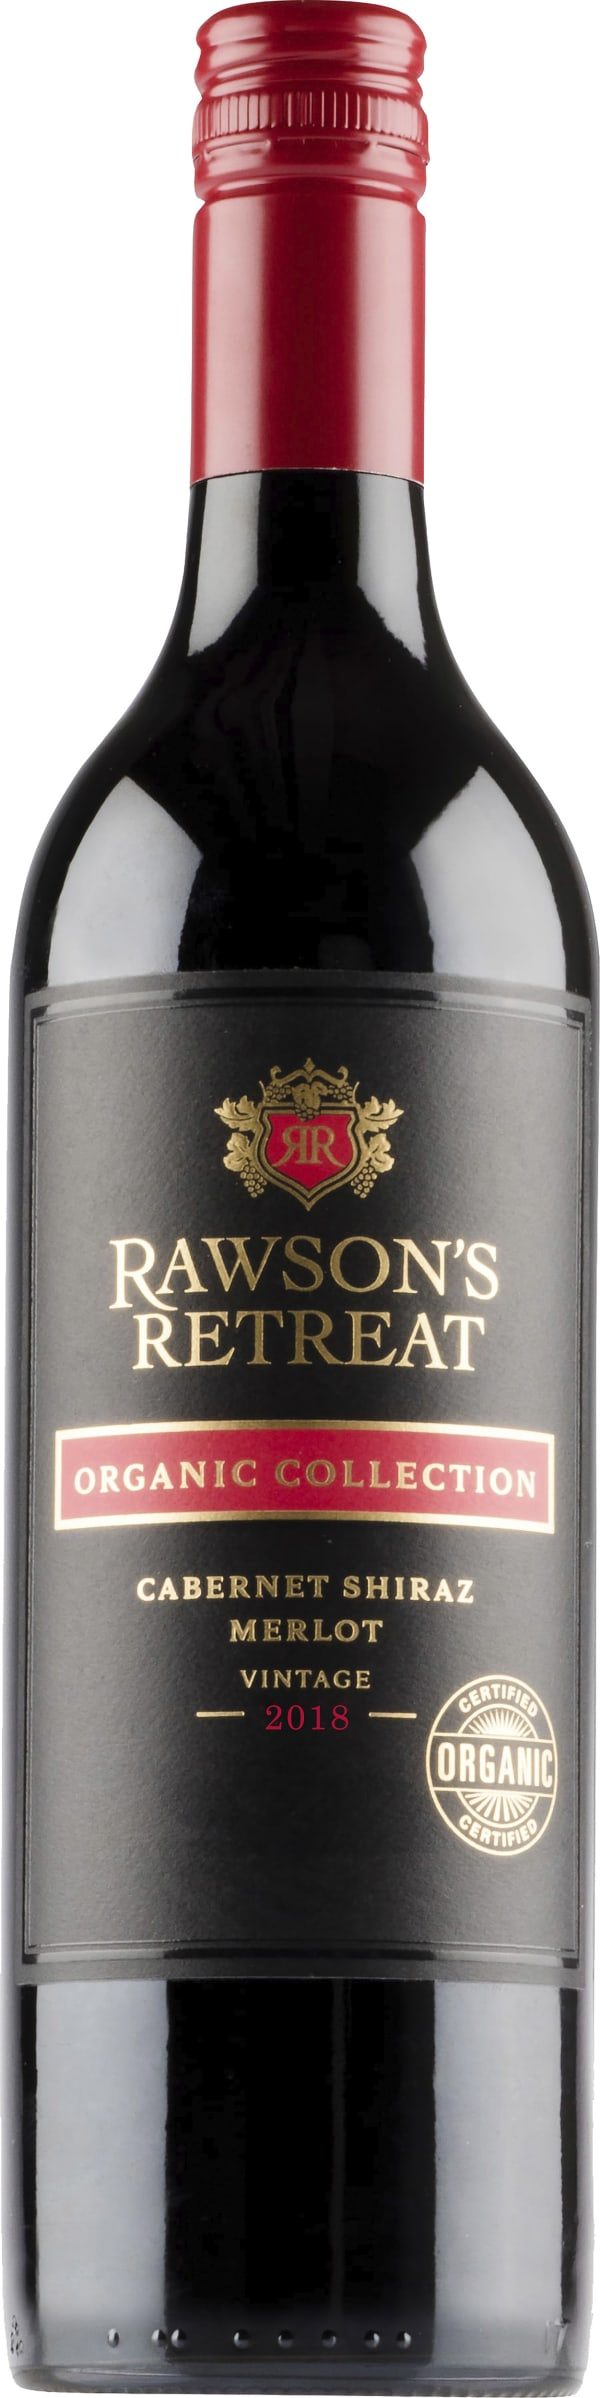 Rawson's Retreat Organic Collection Cabernet Shiraz Merlot 2018